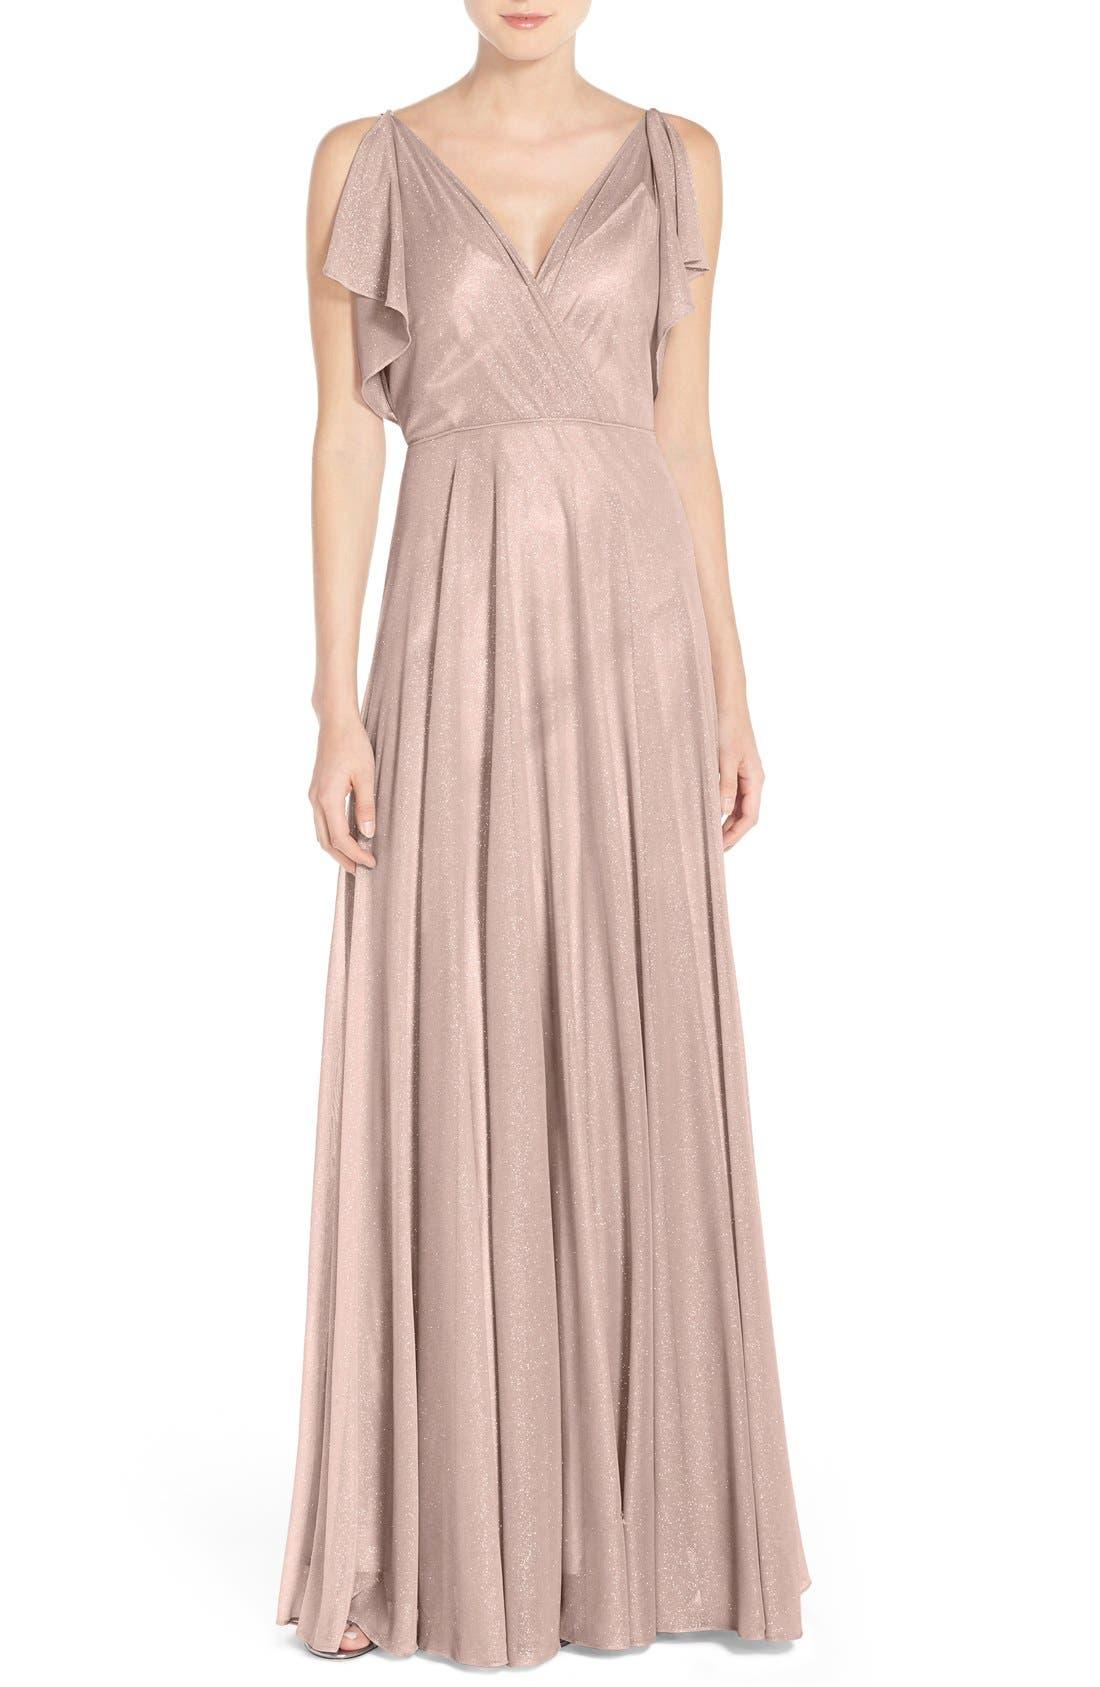 Alternate Image 1 Selected - Jenny Yoo 'Cassie' V-Neck Flutter Sleeve Shimmer Gown